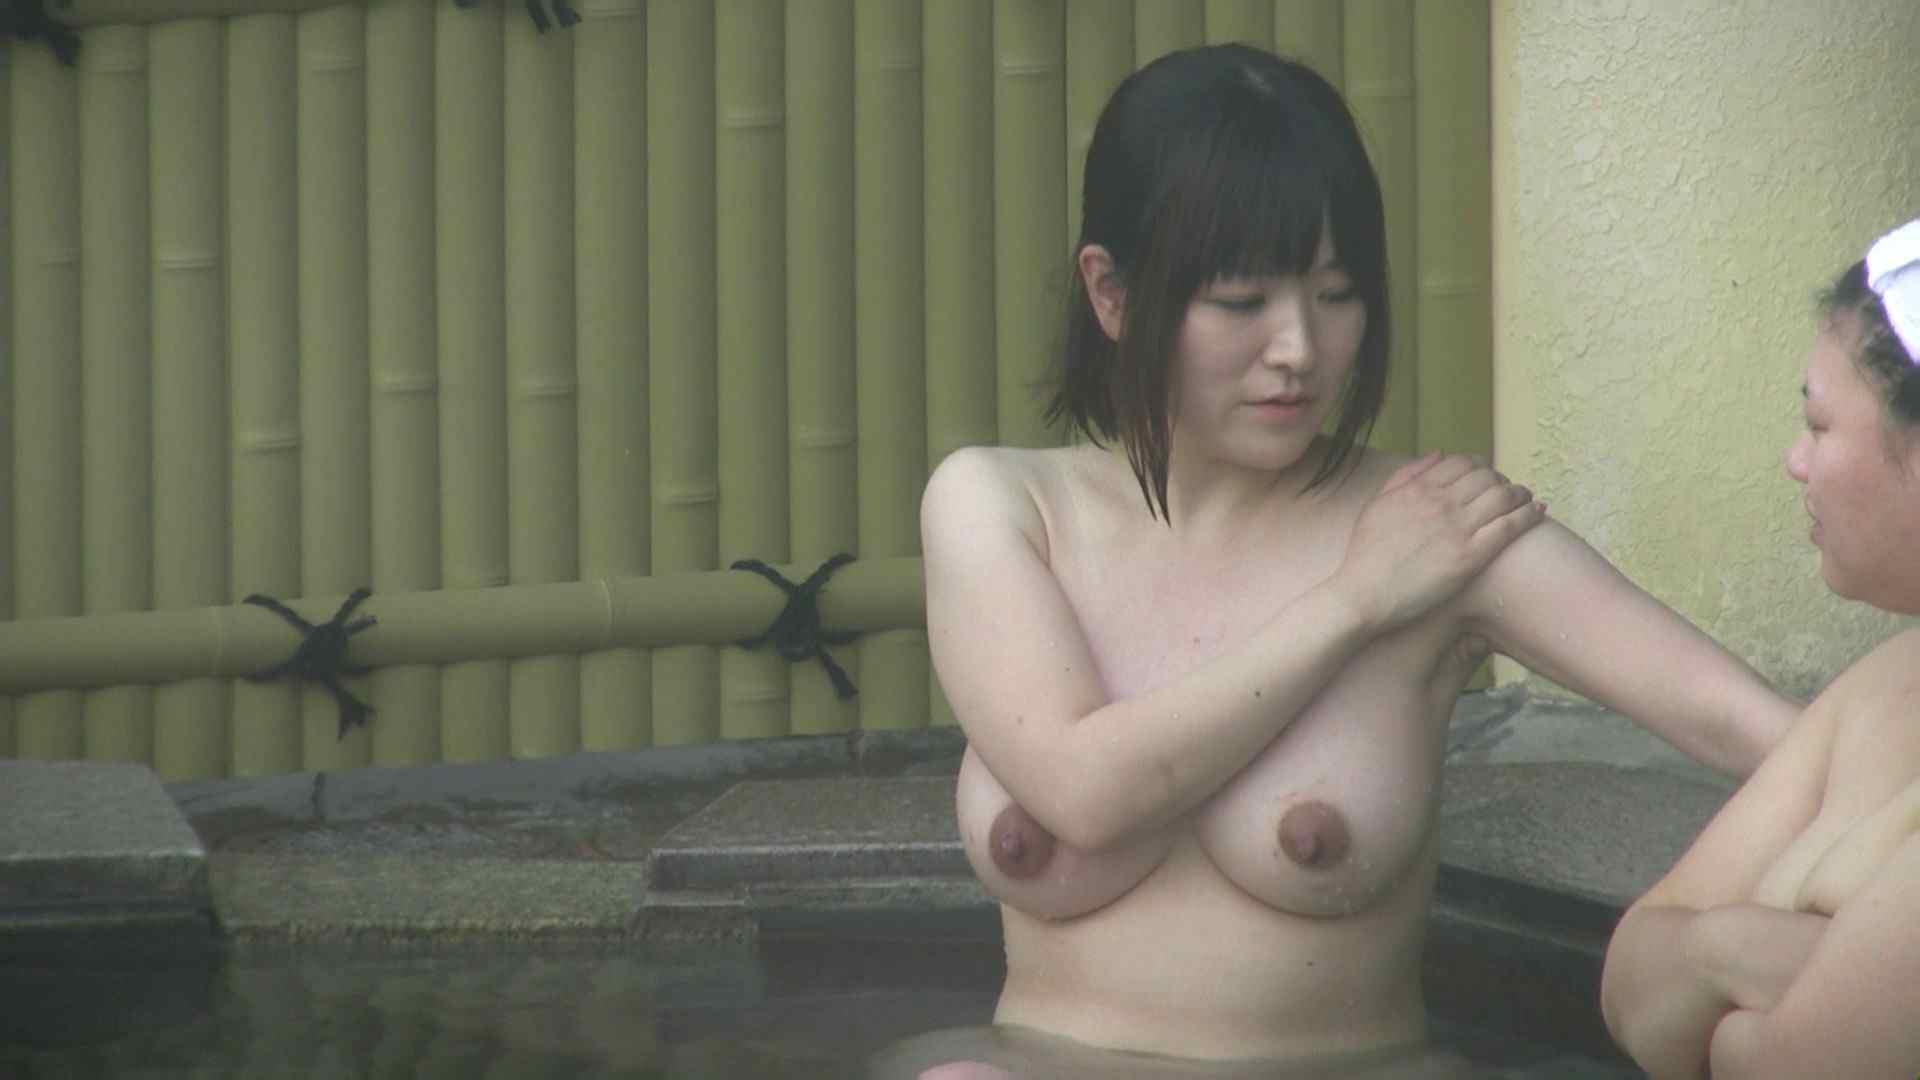 Aquaな露天風呂Vol.606 露天 スケベ動画紹介 110枚 101